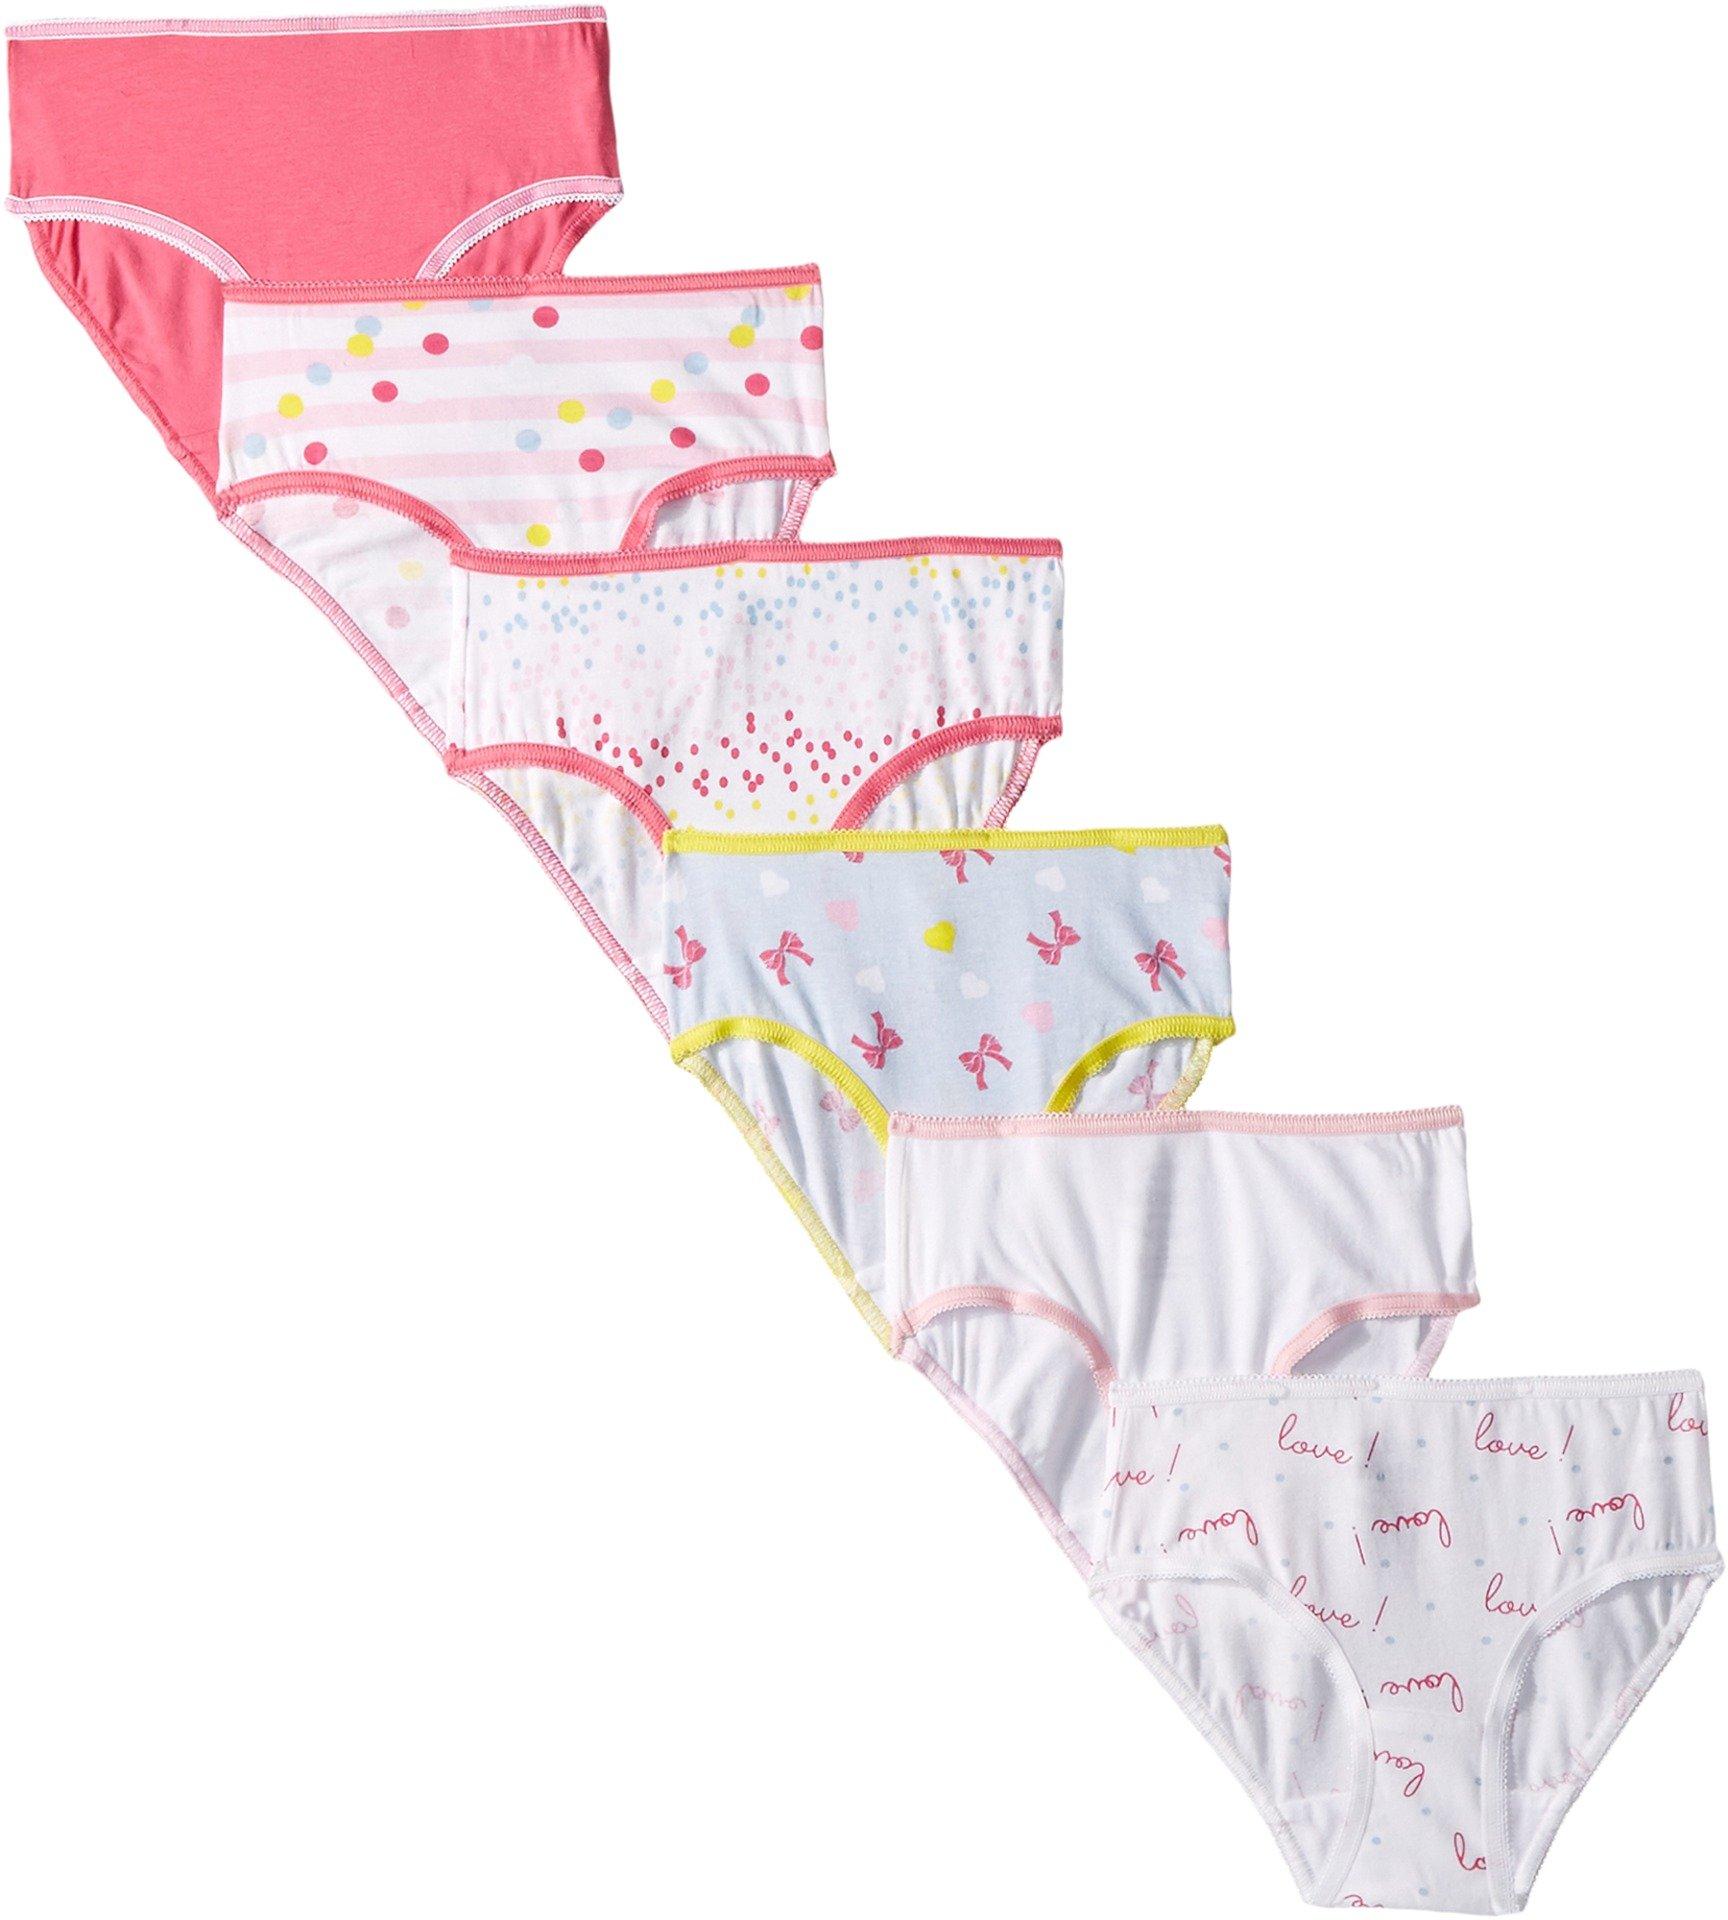 Trimfit Little Girls' Tagless Assorted Briefs Underwear (Pack of 6), Love Bows, Small/4-6